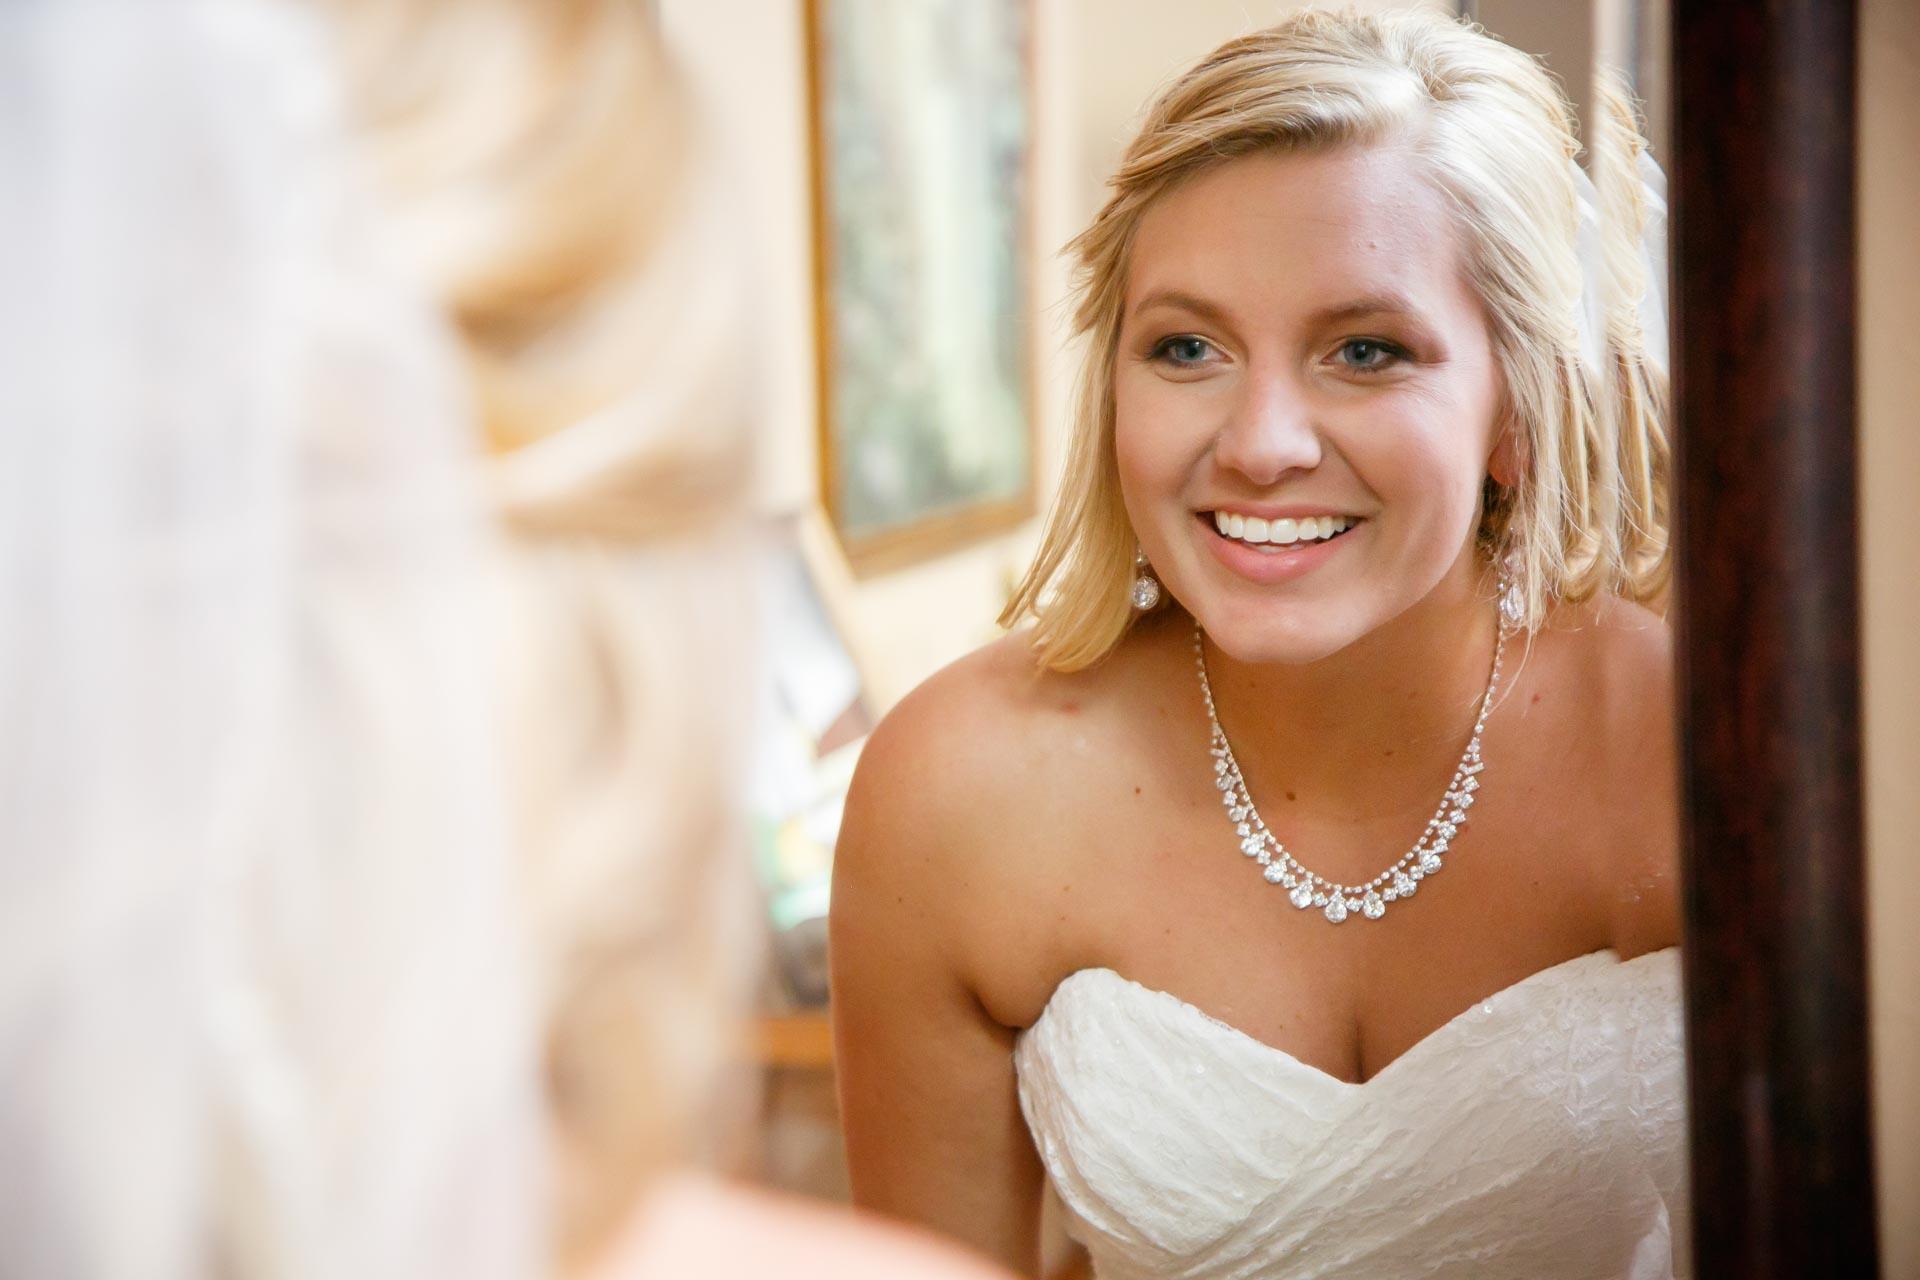 wedding-2-adam-shea-photography-green-bay-appleton-neenah-photographer-15.jpg